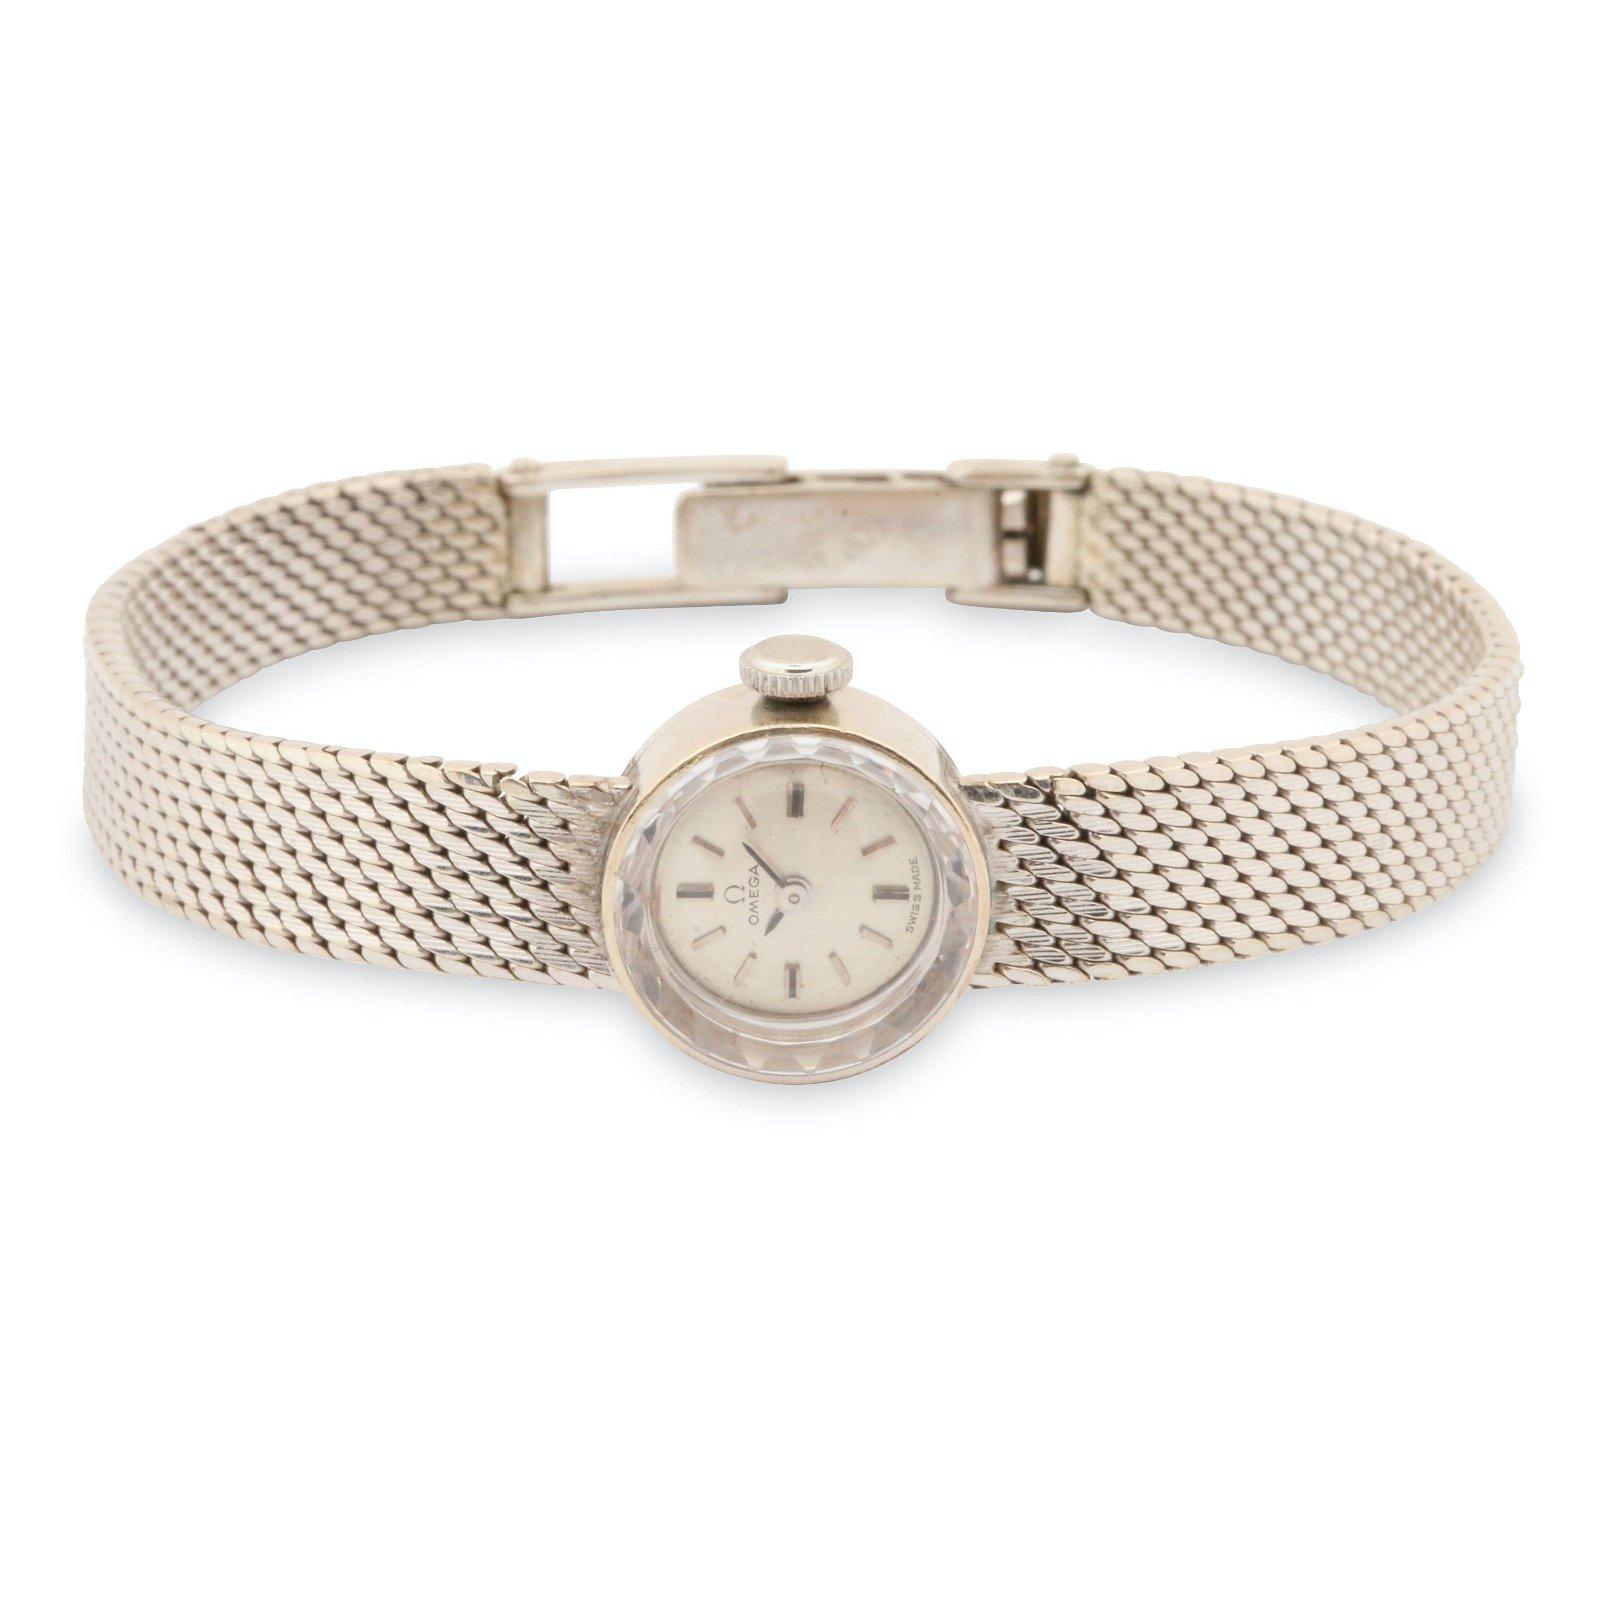 Omega, 14K White Gold Ladies Cocktail Wristwatch